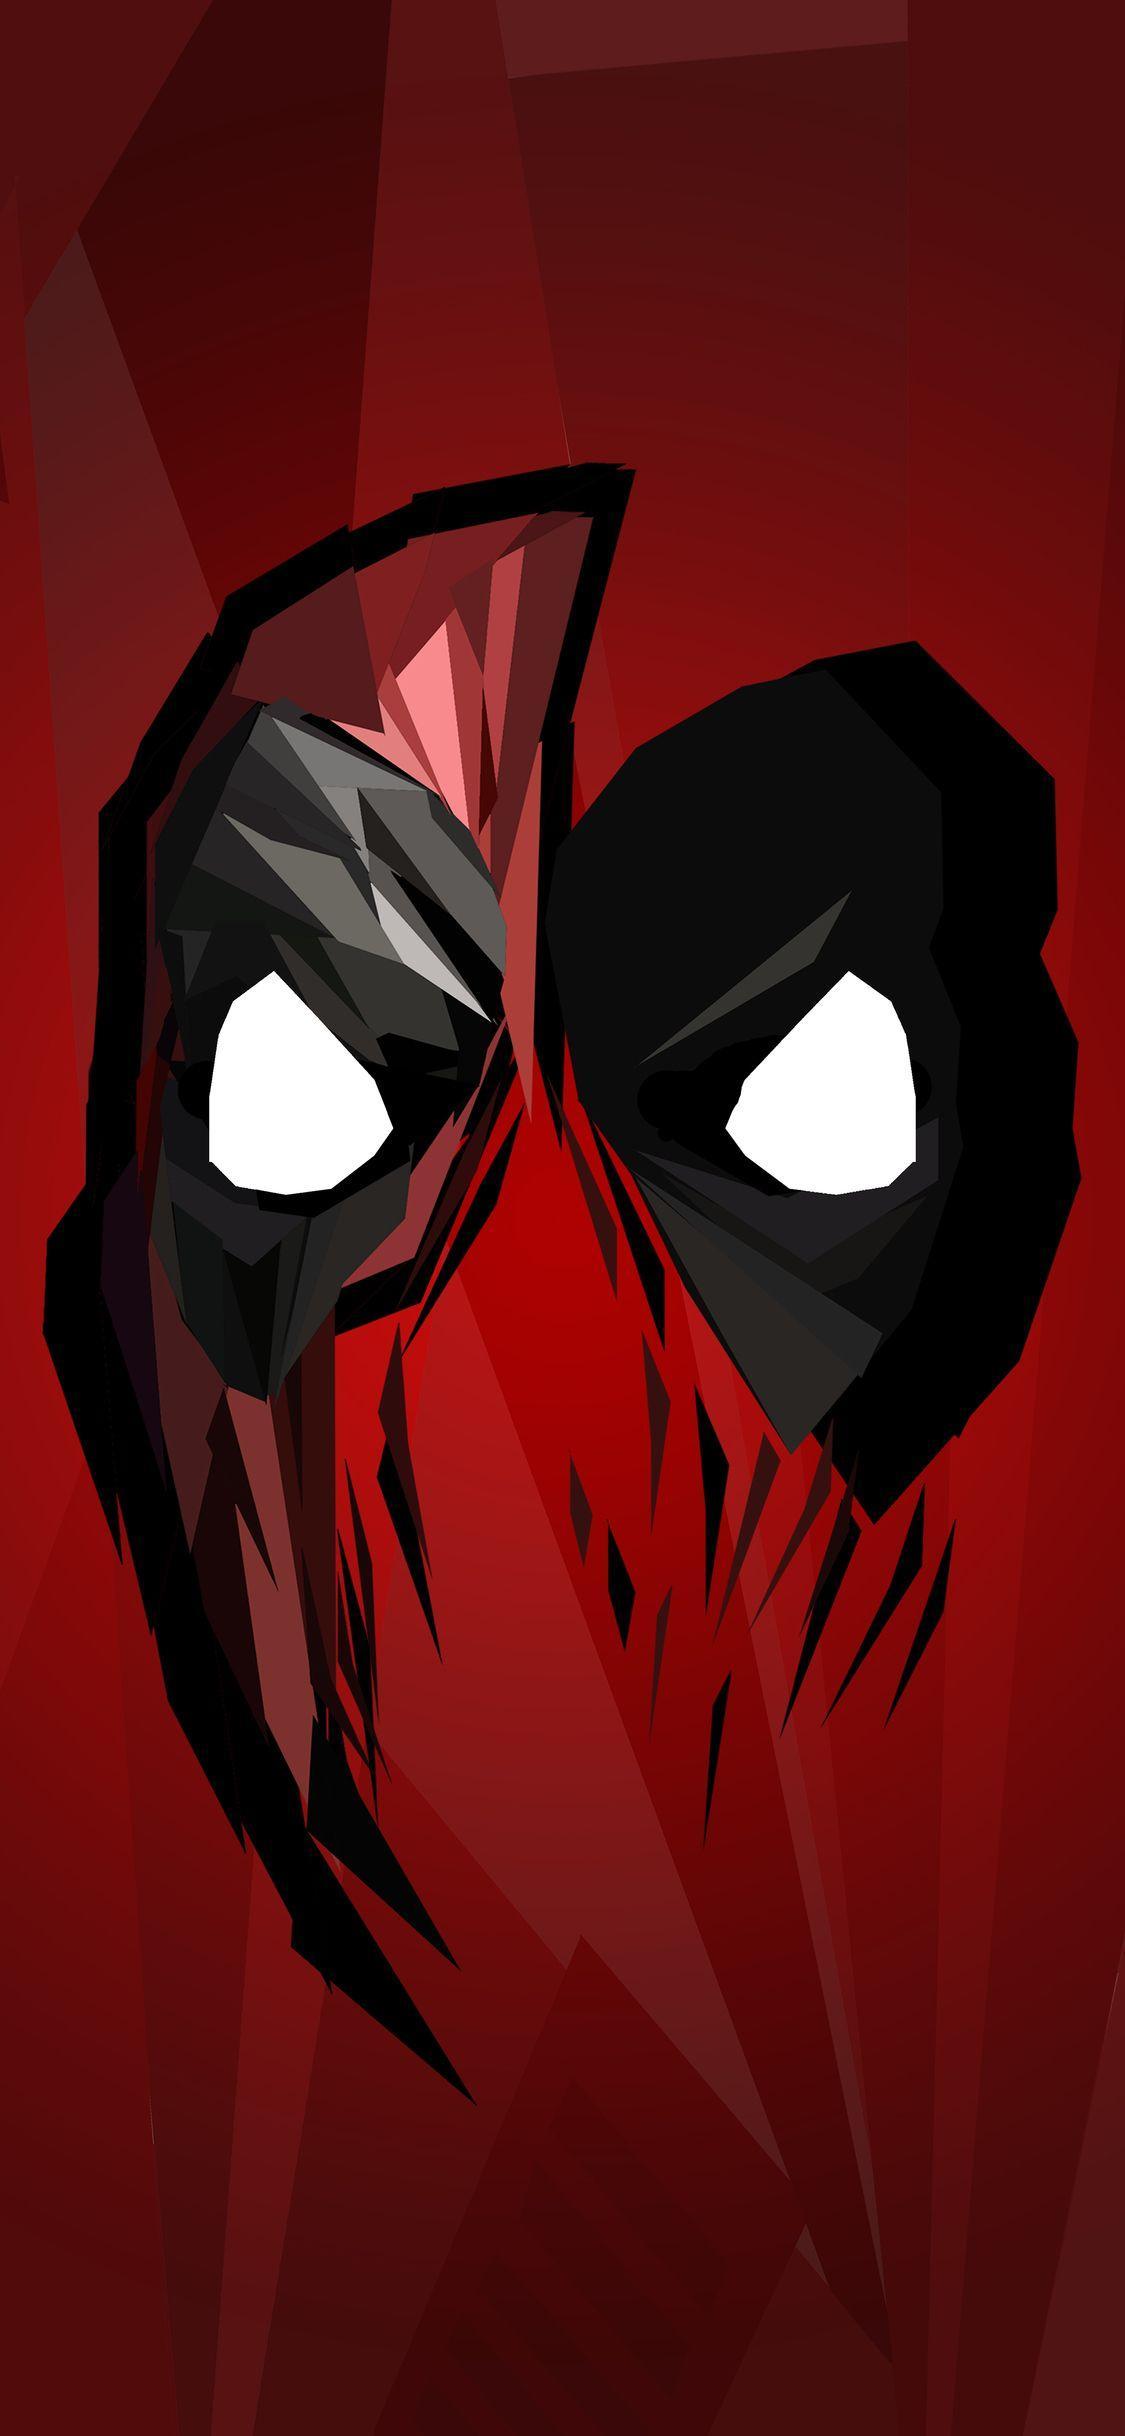 Cartoon Deadpool iPhone Wallpapers - Top Free Cartoon ...